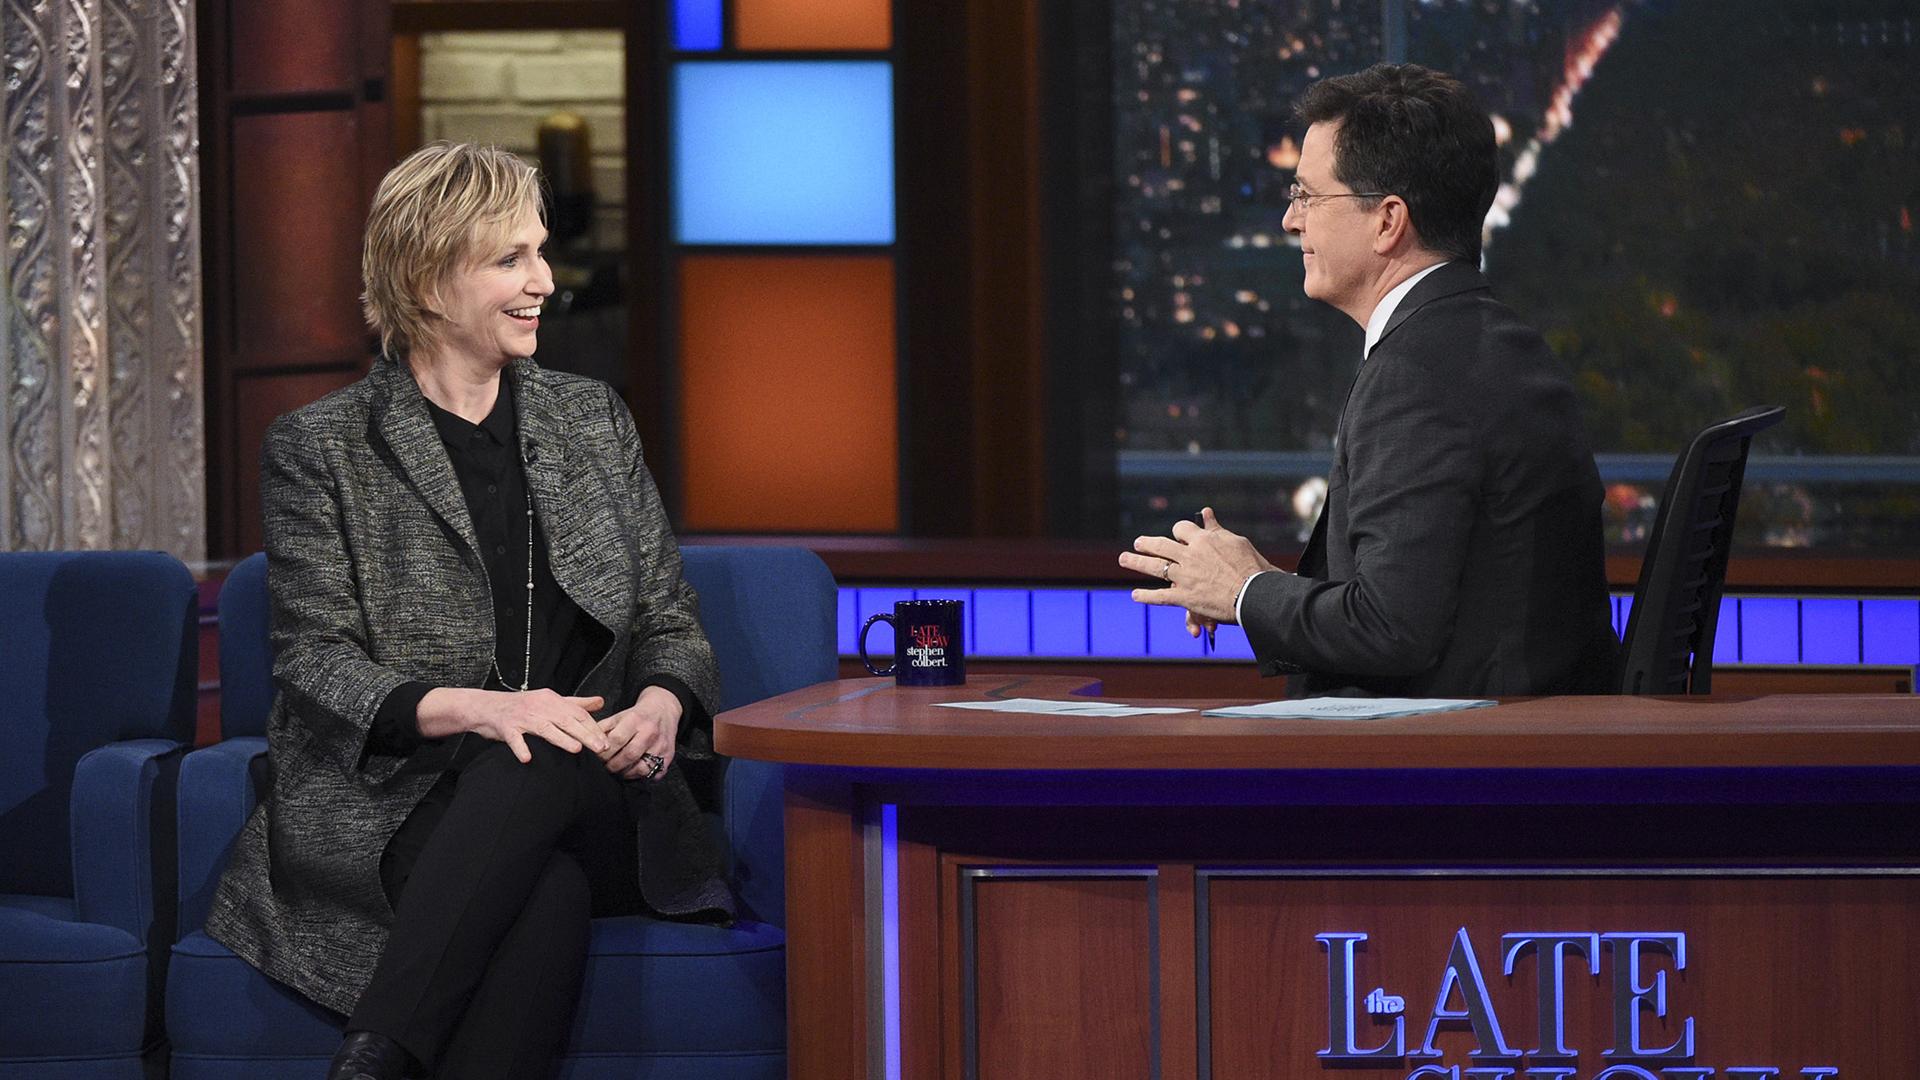 Jane Lynch and Stephen Colbert